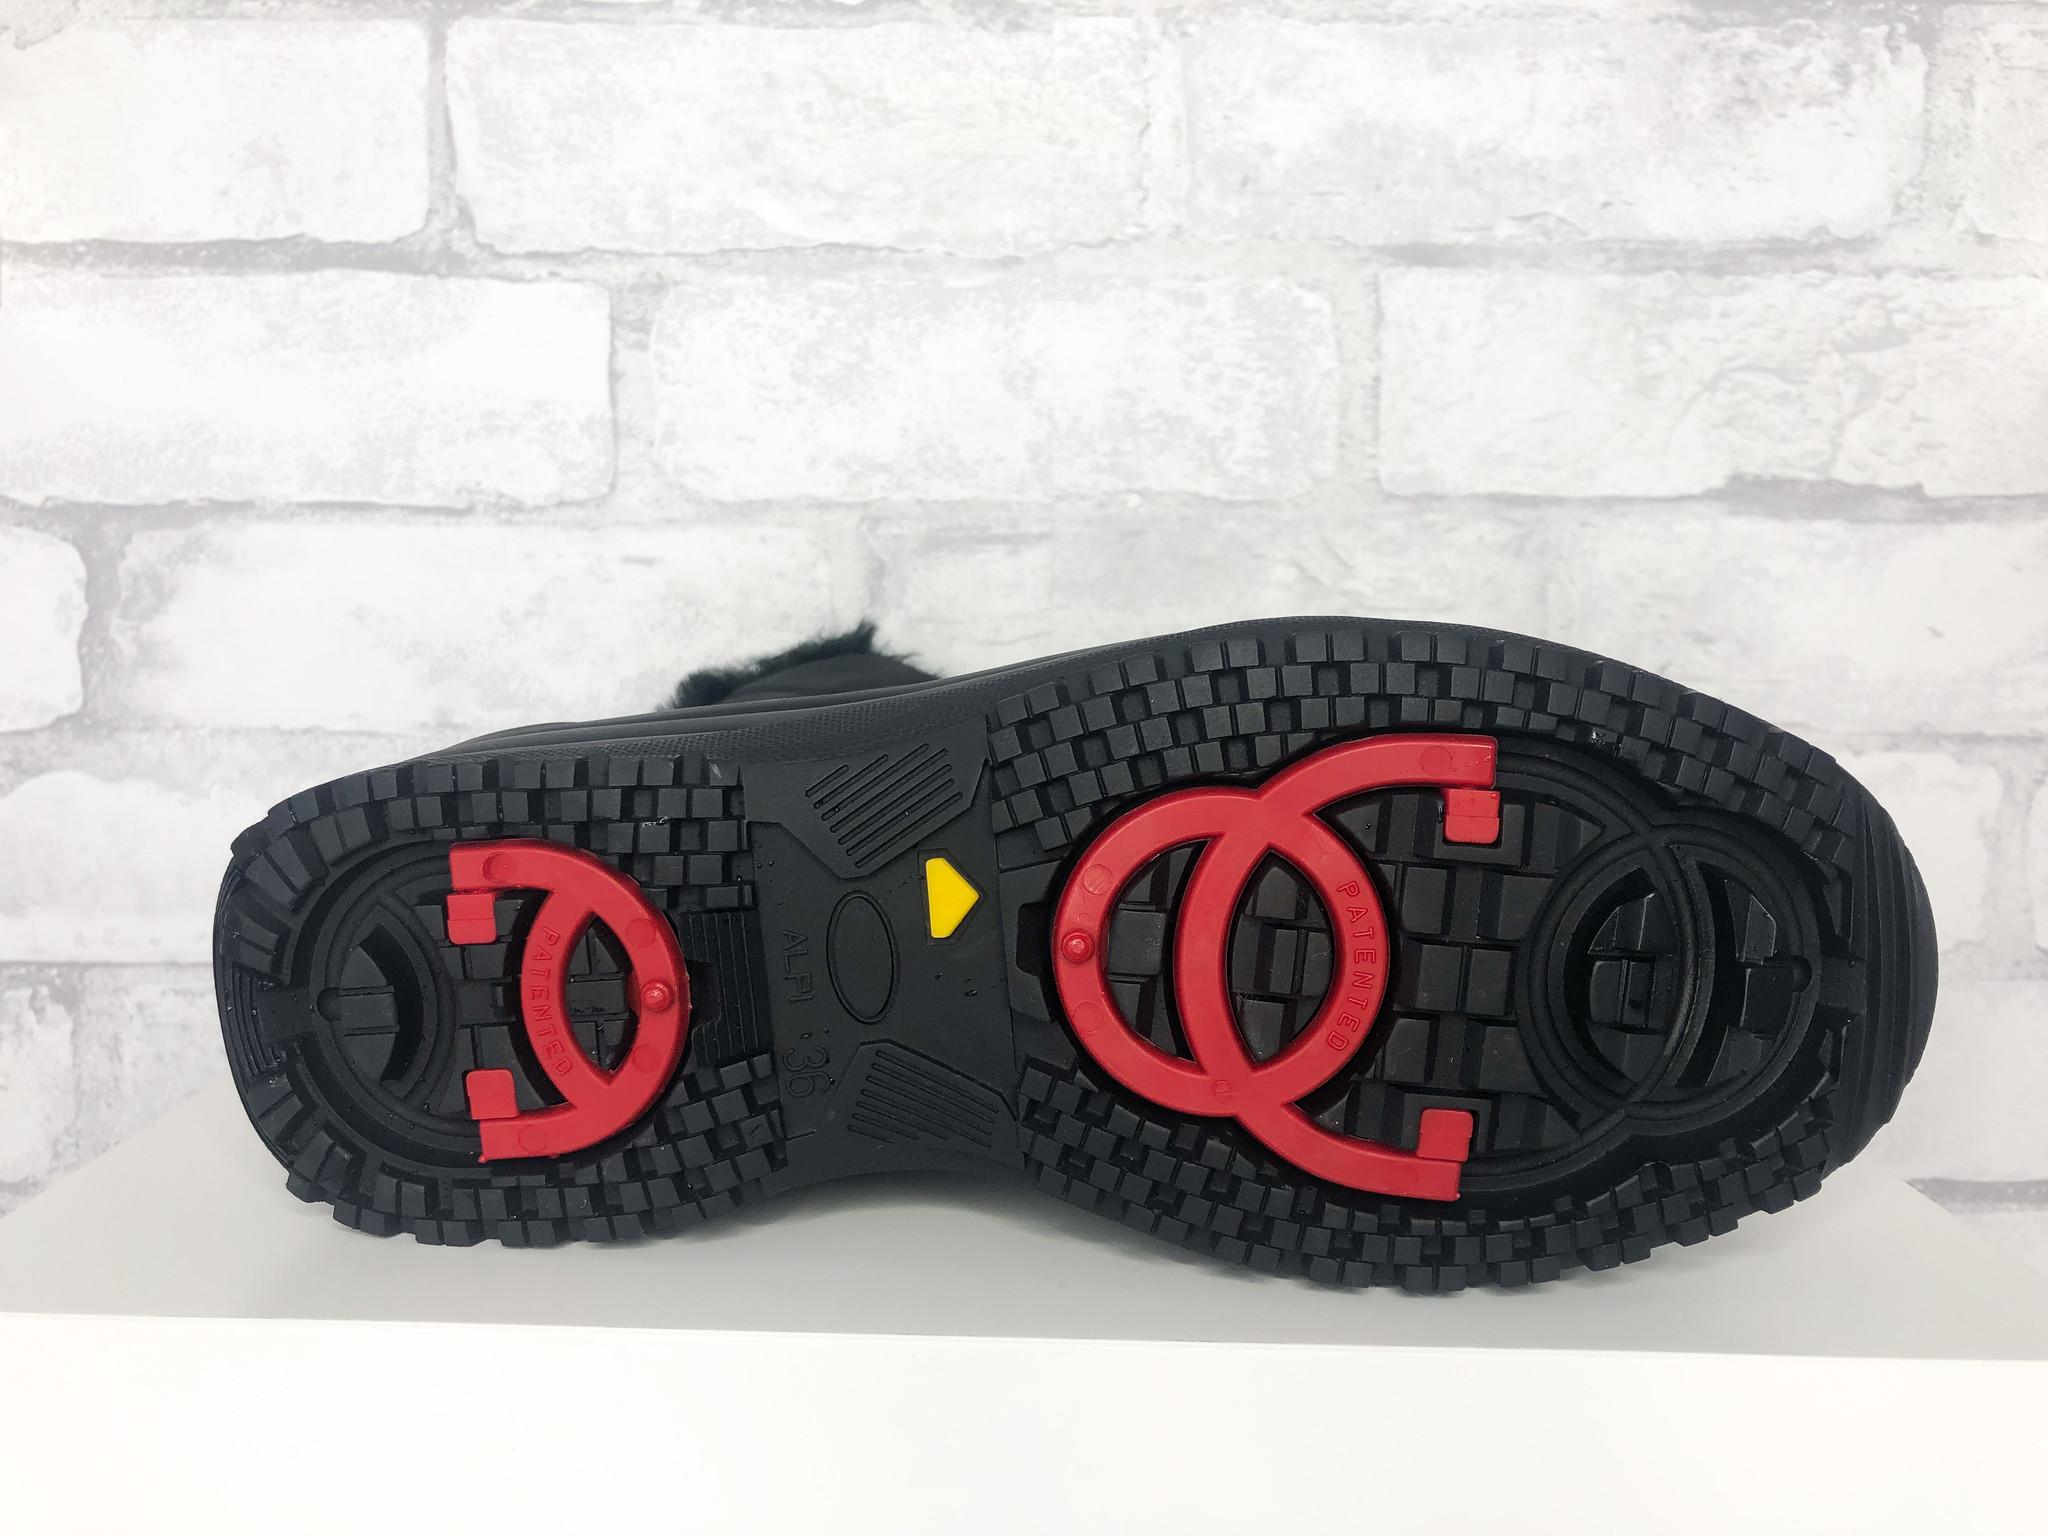 Attiba 799P/OC48 Black Winter Boot